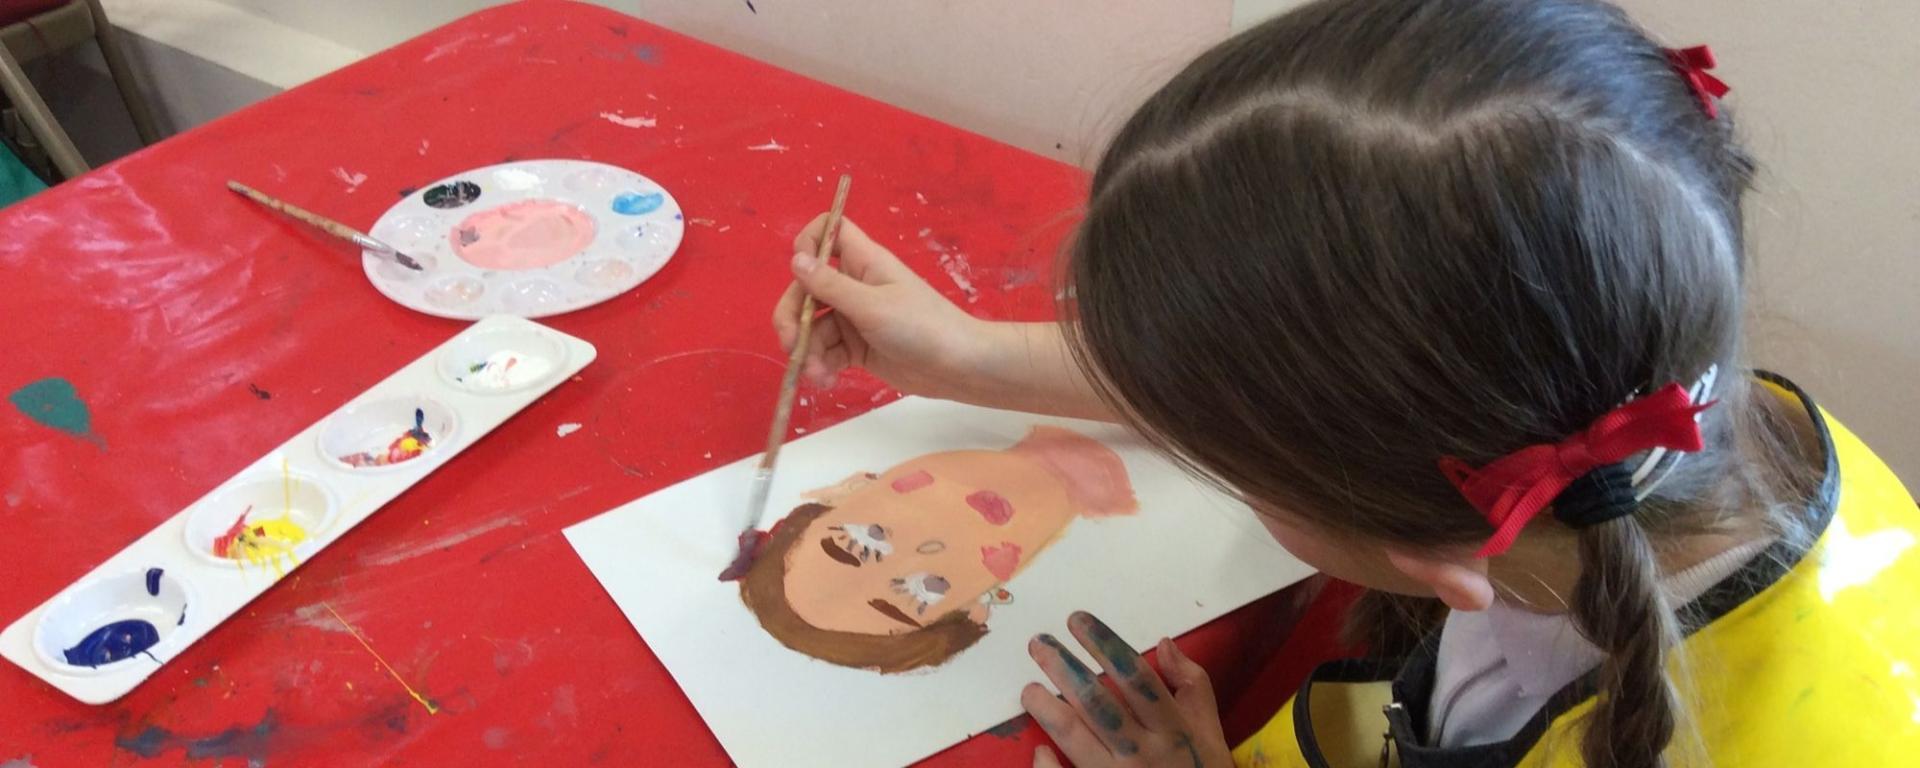 School Child Painting A Self Portrait